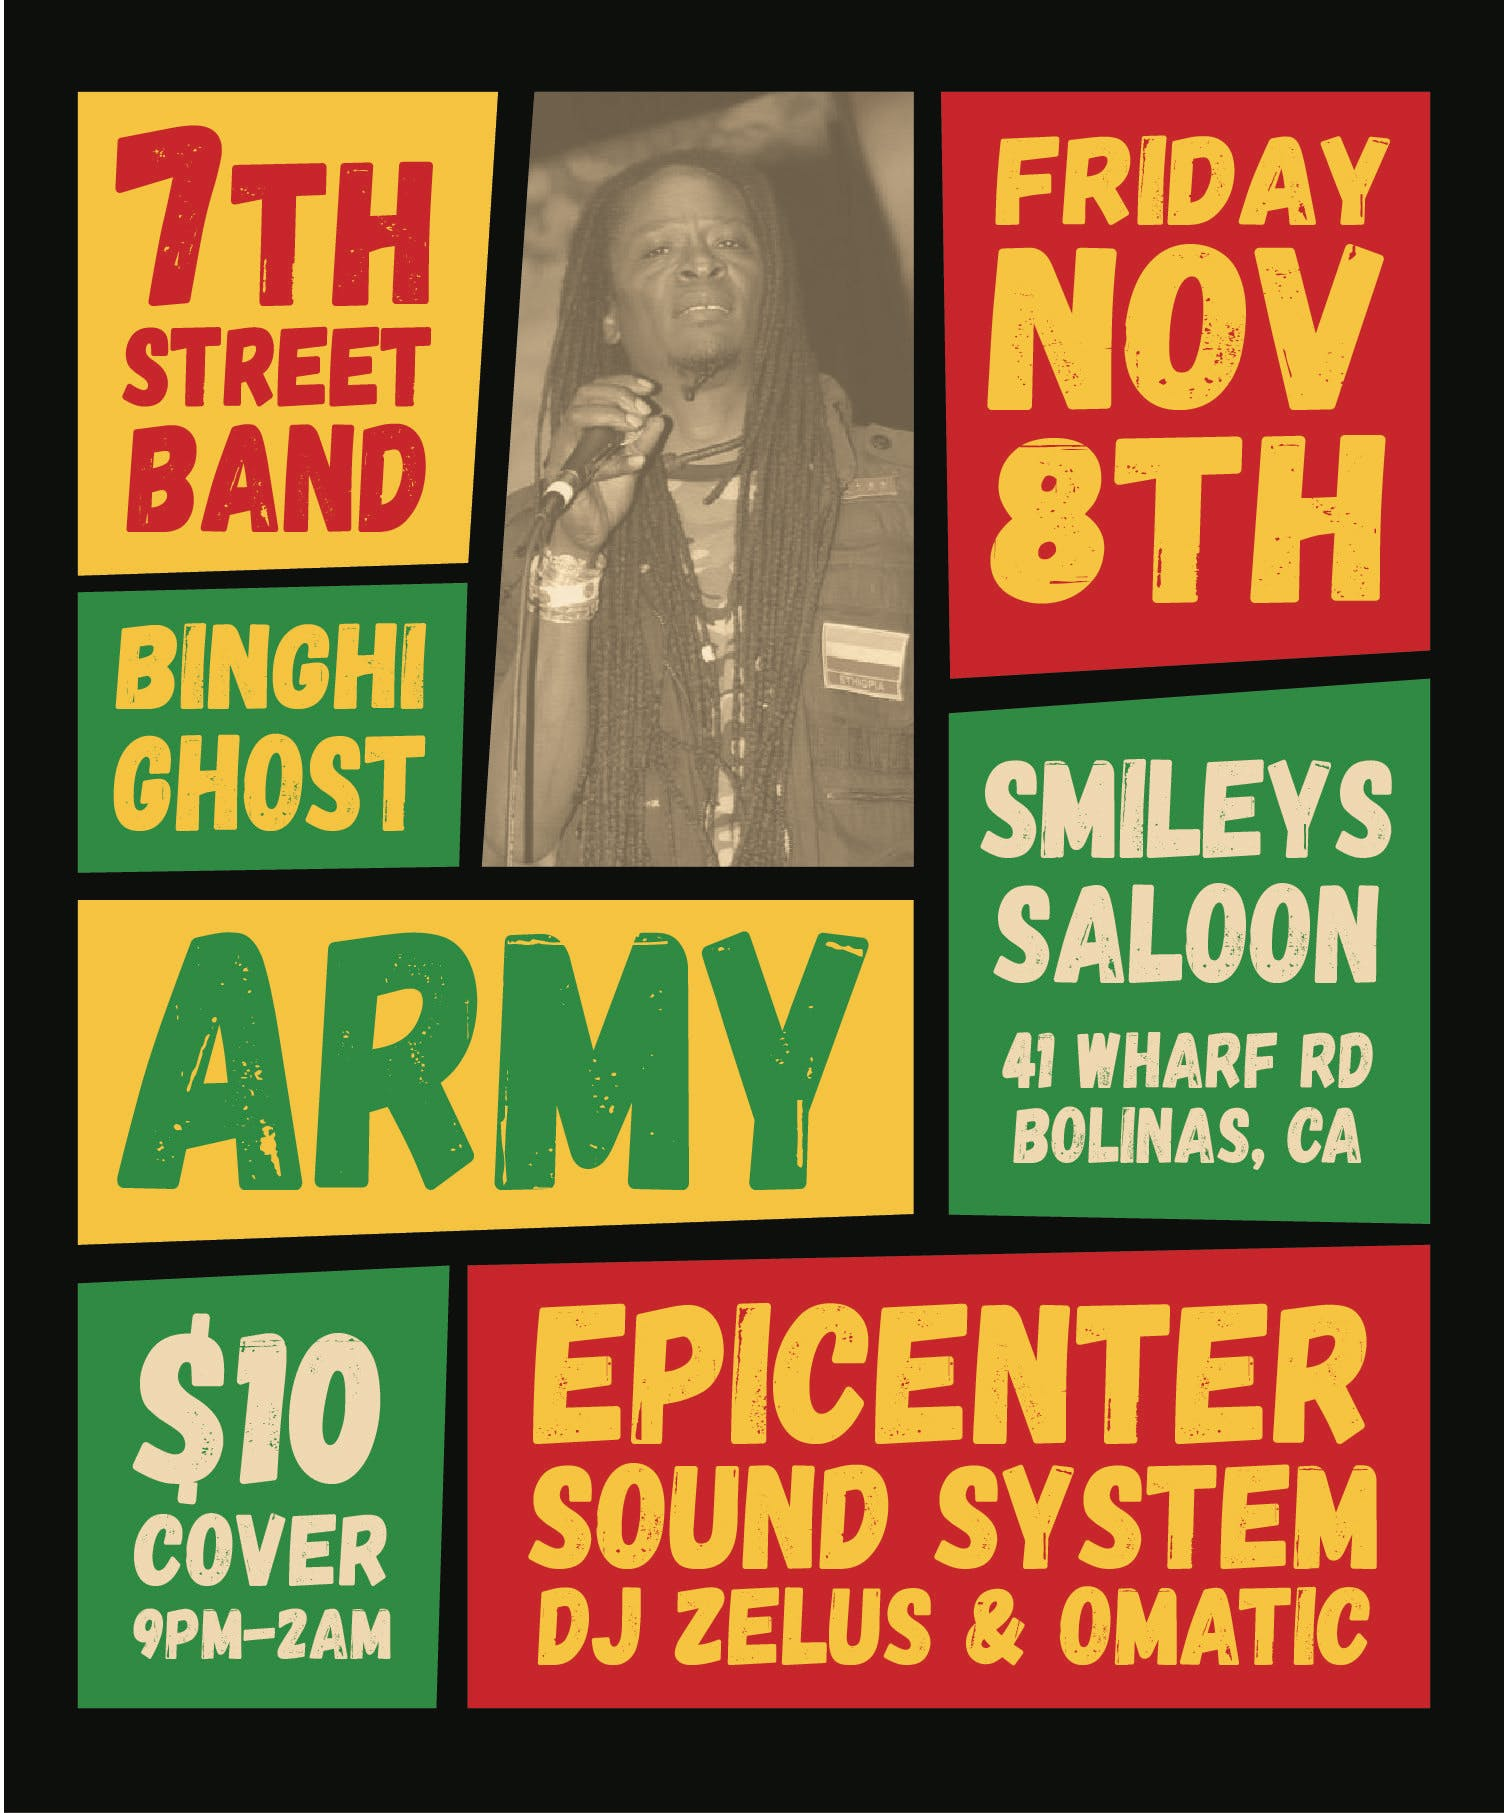 Army, Binghi Ghost, 7th Street Band, Epicenter Sound System, DJ Zelus